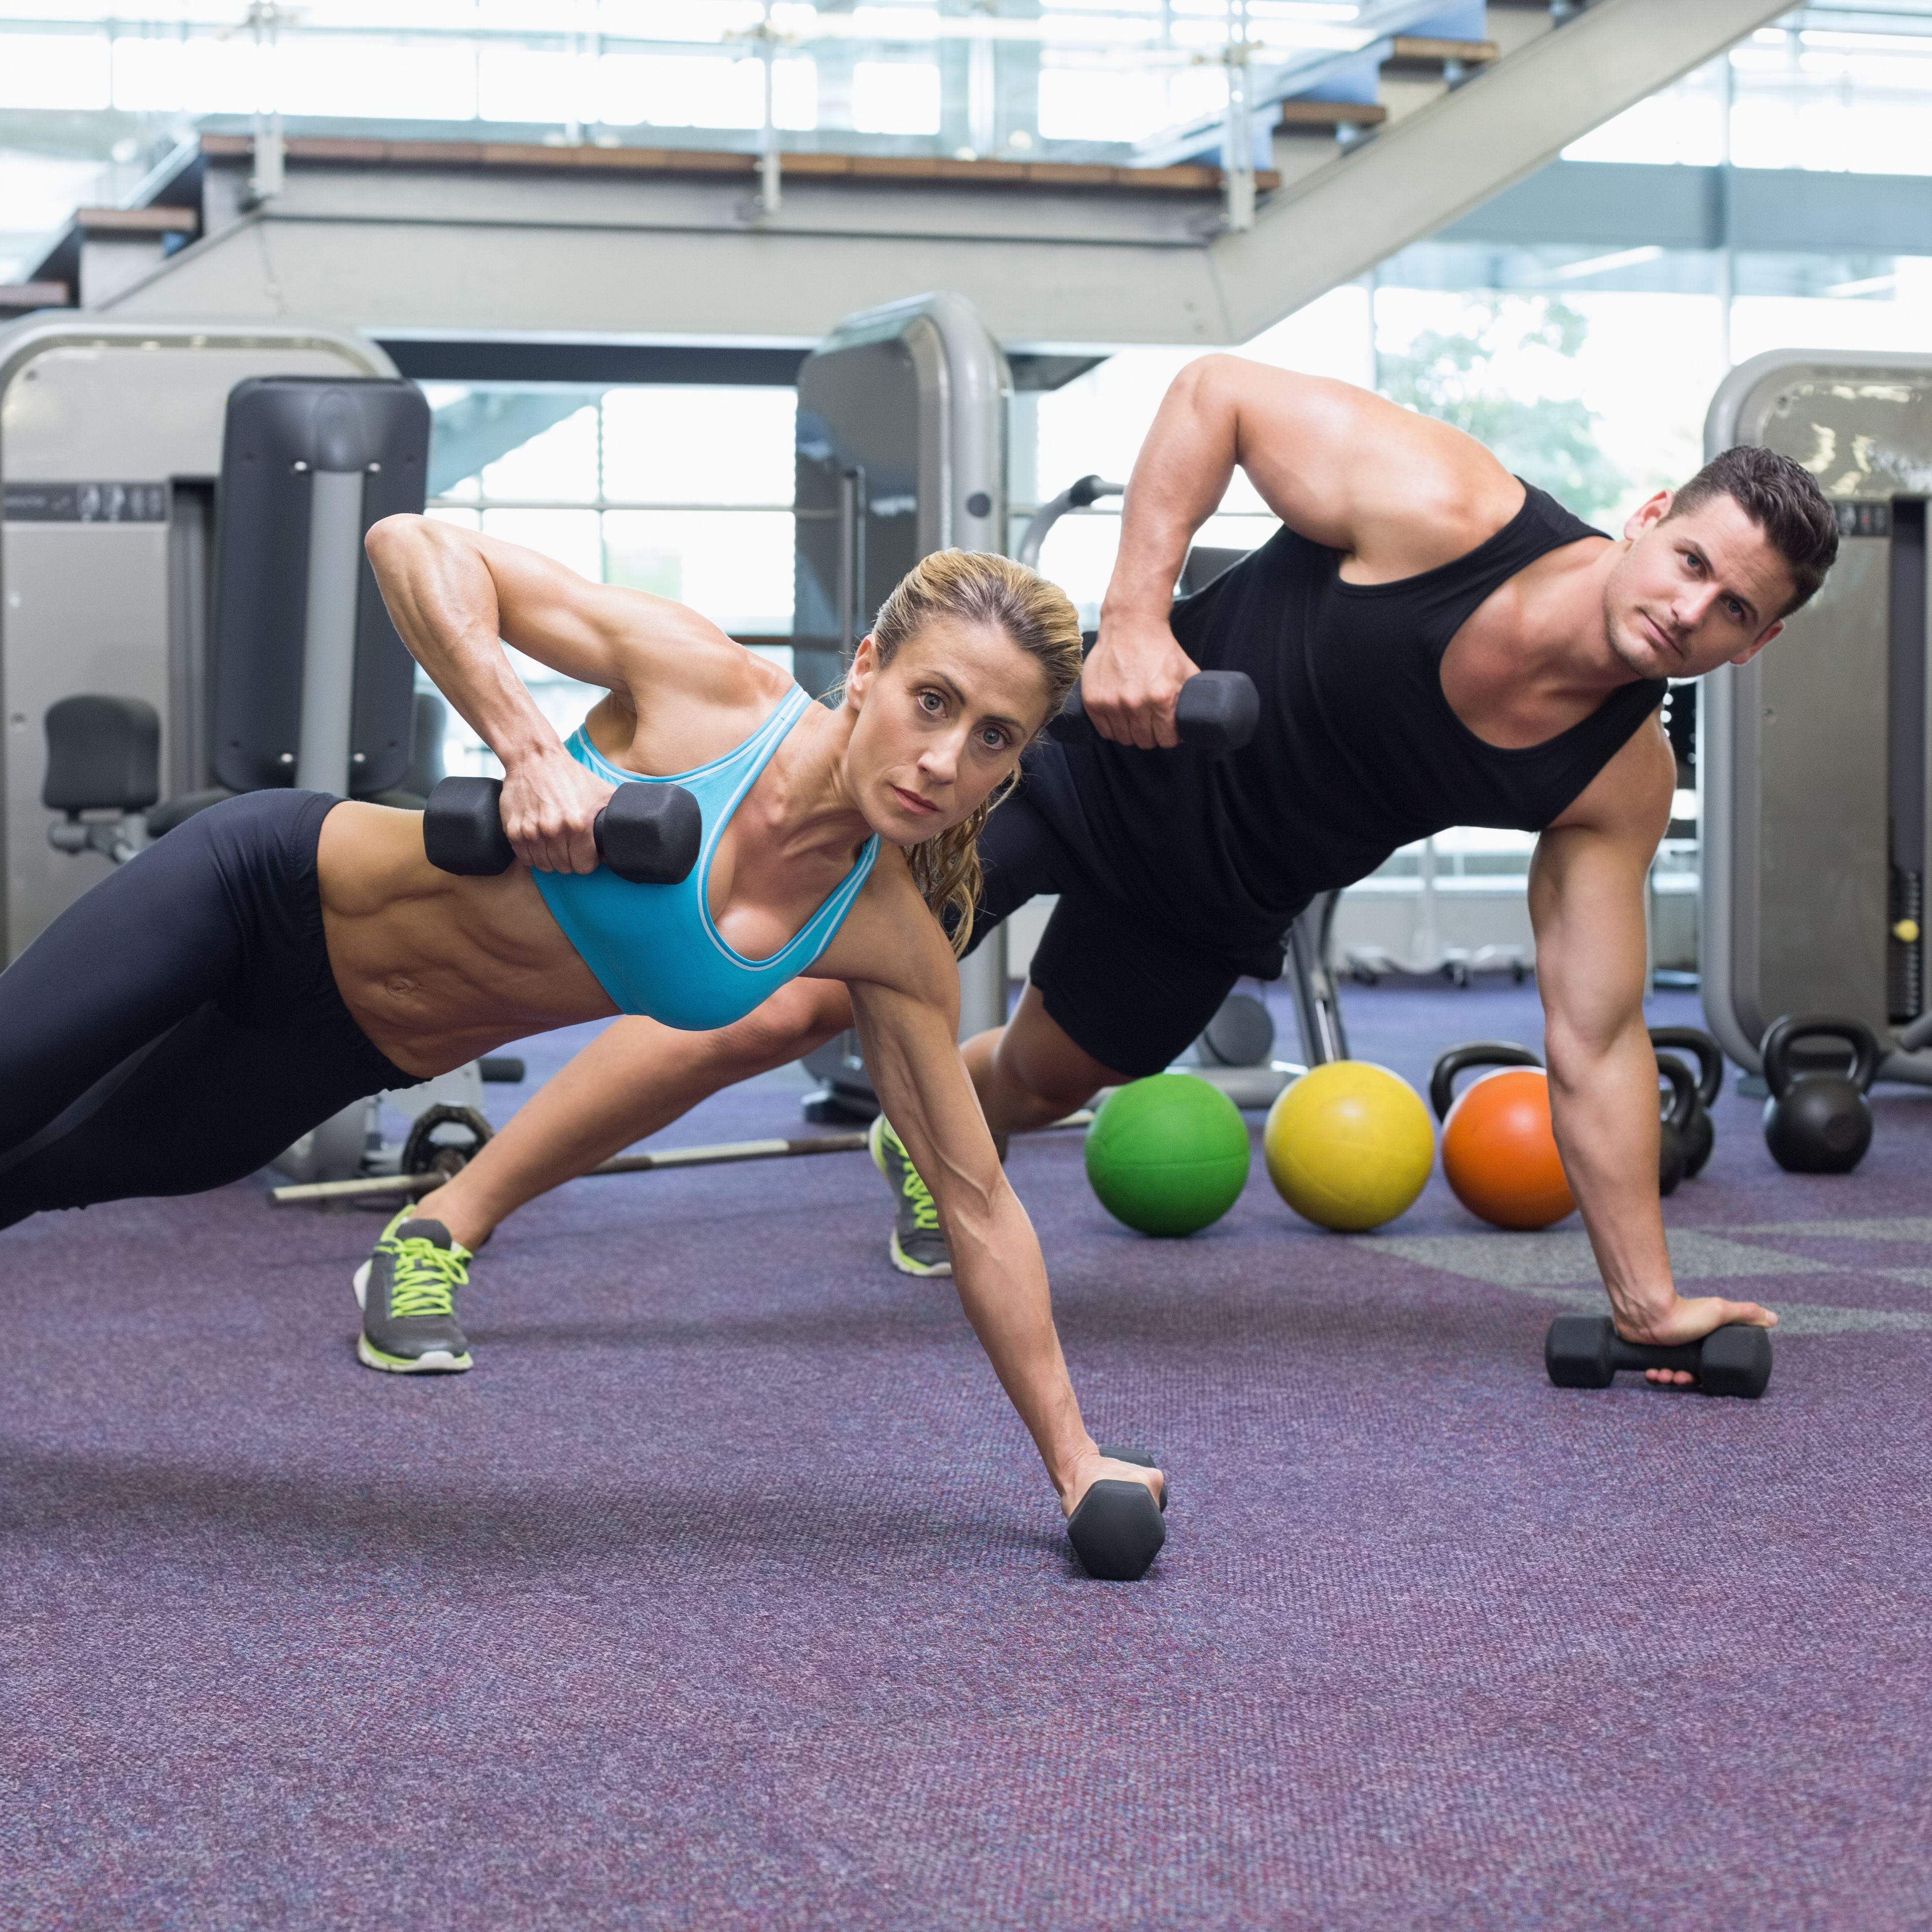 Shutterstock 201174788 j85ytc